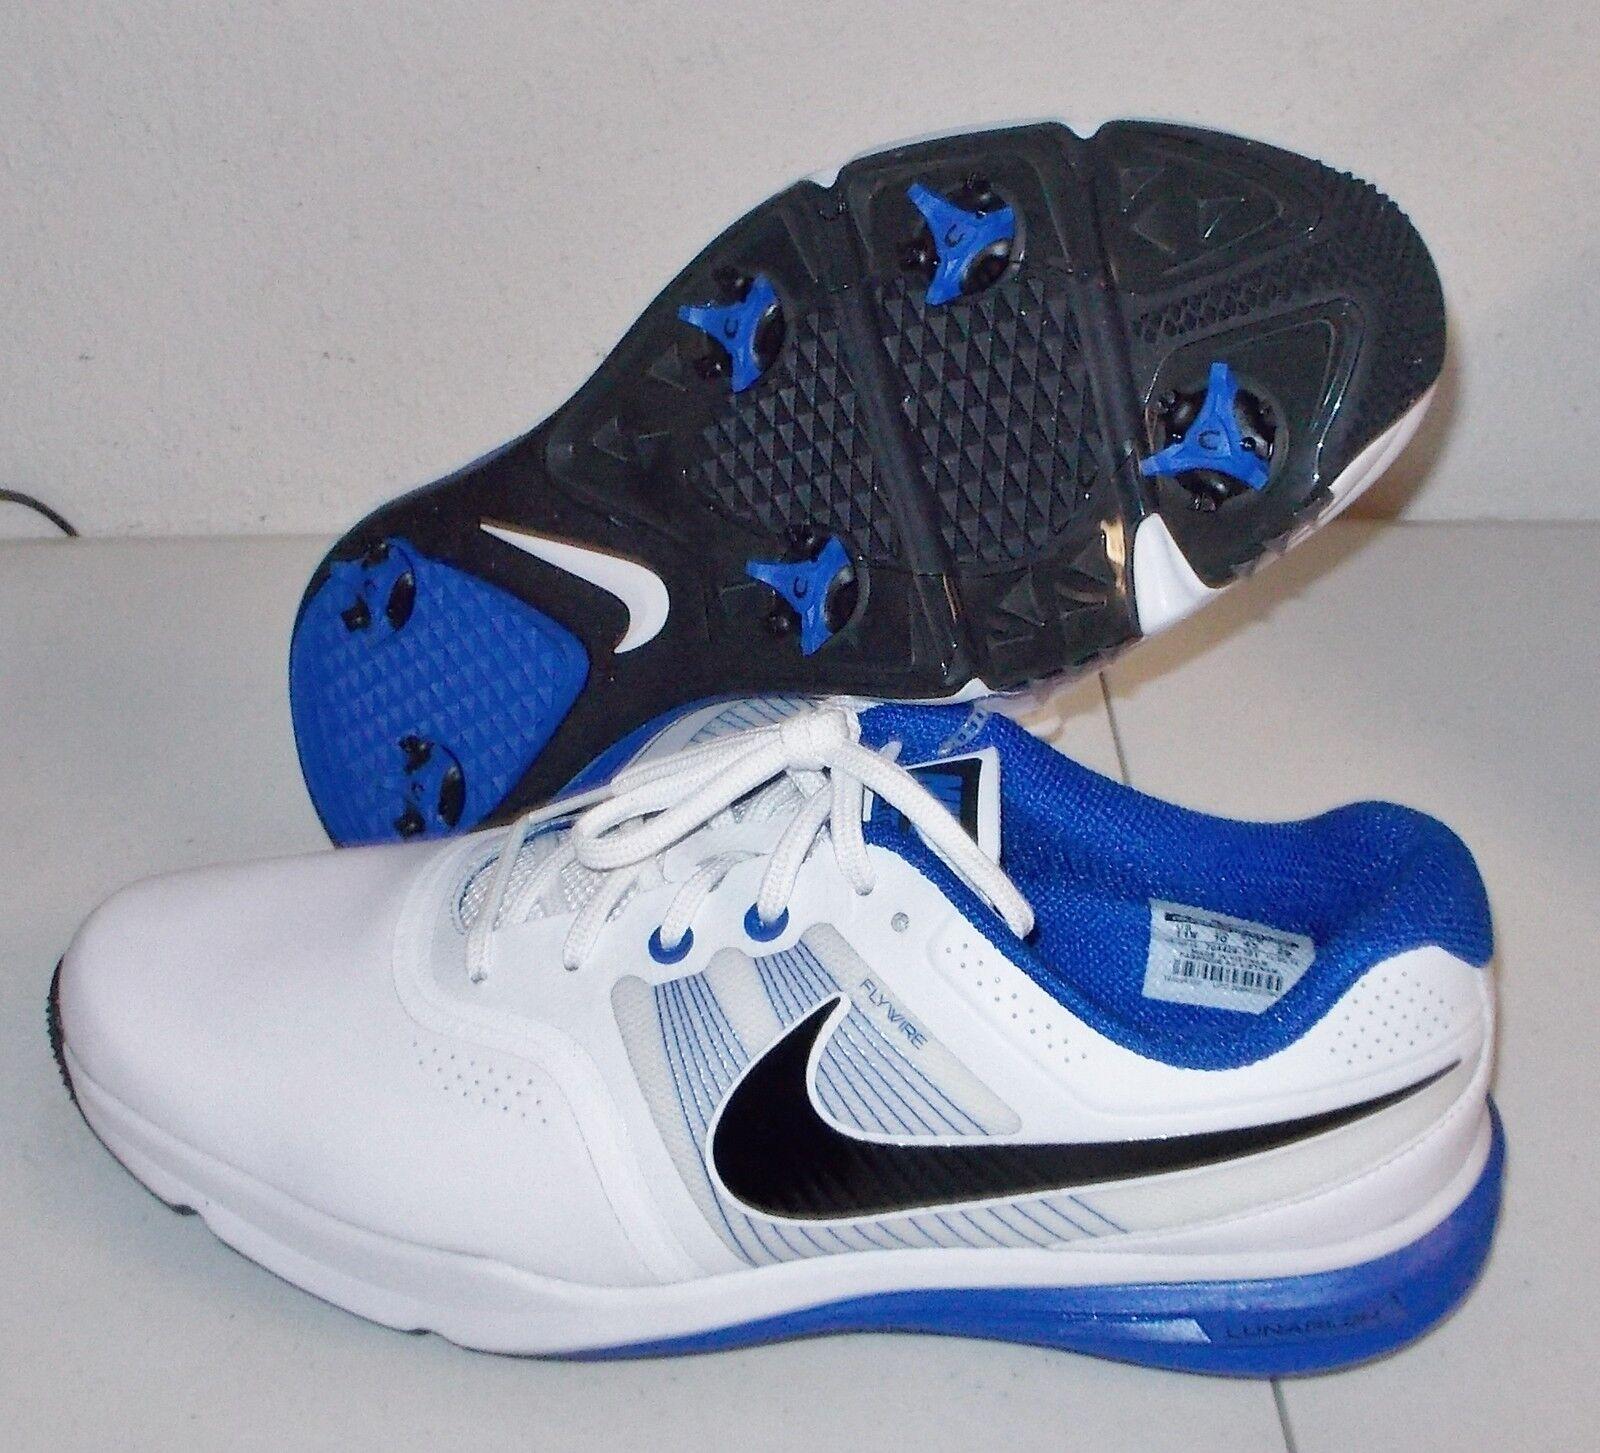 NEW NIKE LUNAR COMMAND Golf Shoes MENS Medium Width White Blue Price reduction